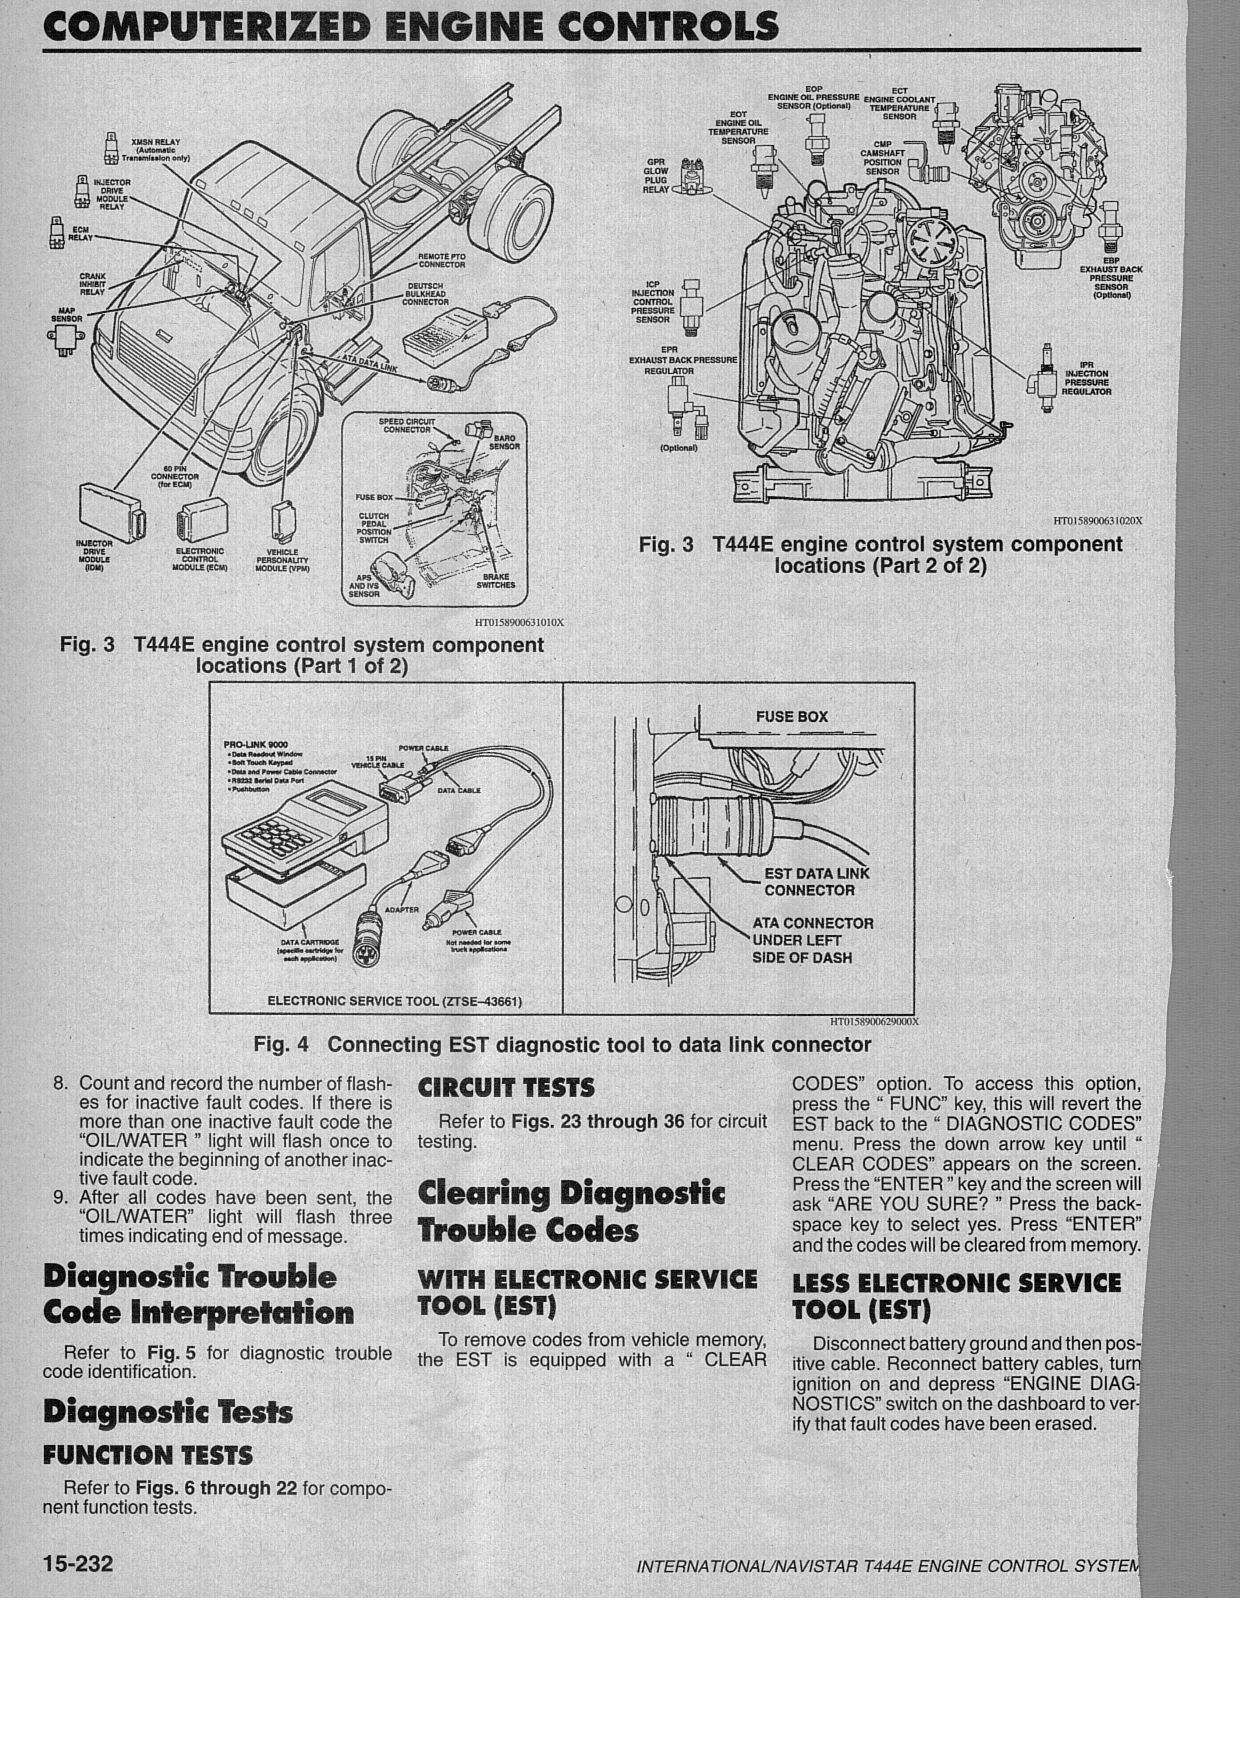 [WLLP_2054]   CT_0745] Vt365 Engine Diagram Wiring Diagram | T444e Engine Diagram |  | Jitt Oidei Hyedi Wigeg Mohammedshrine Librar Wiring 101